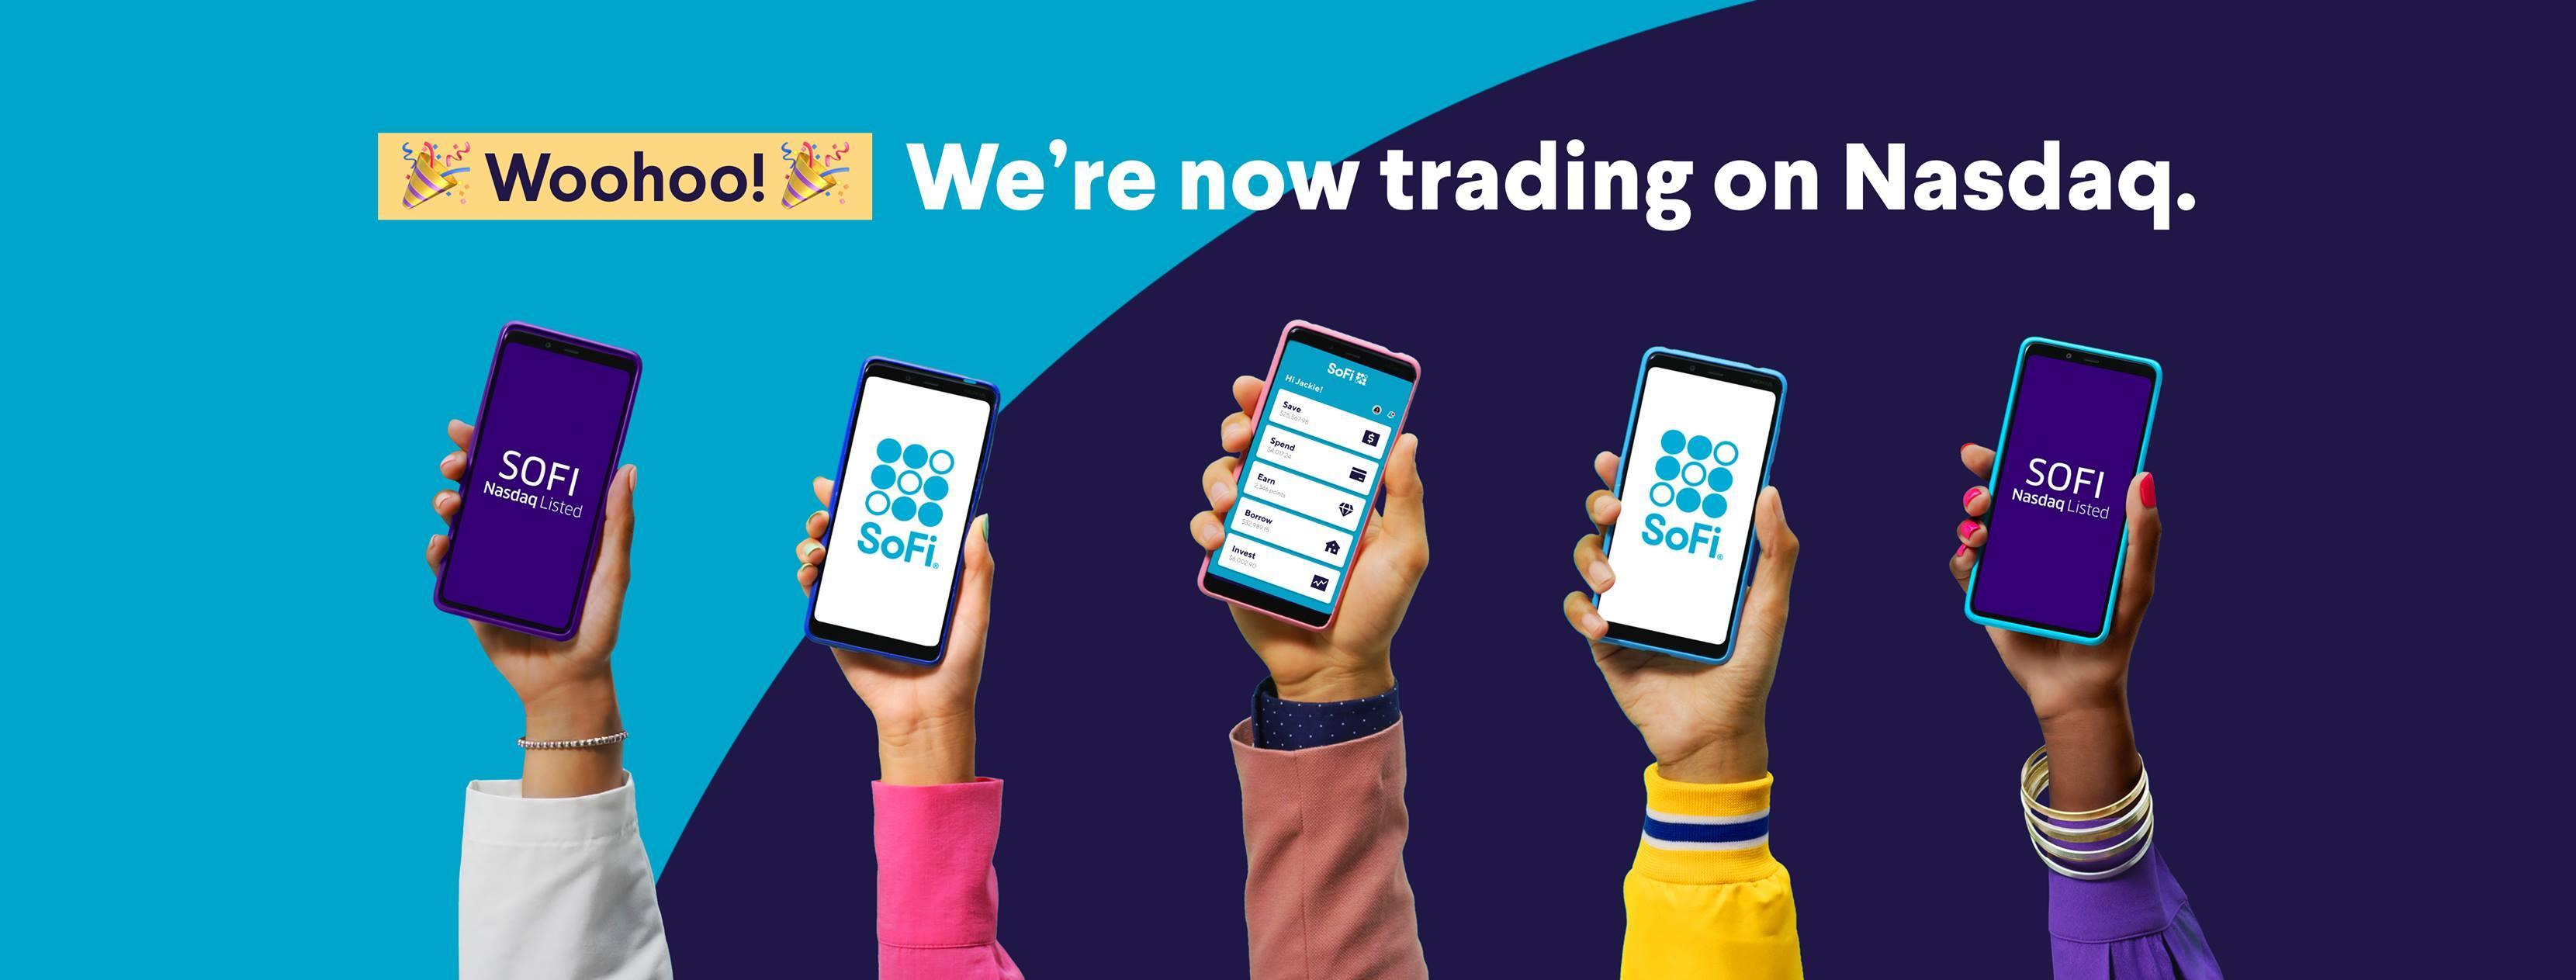 SoFi advertisement about trading on Nasdaq